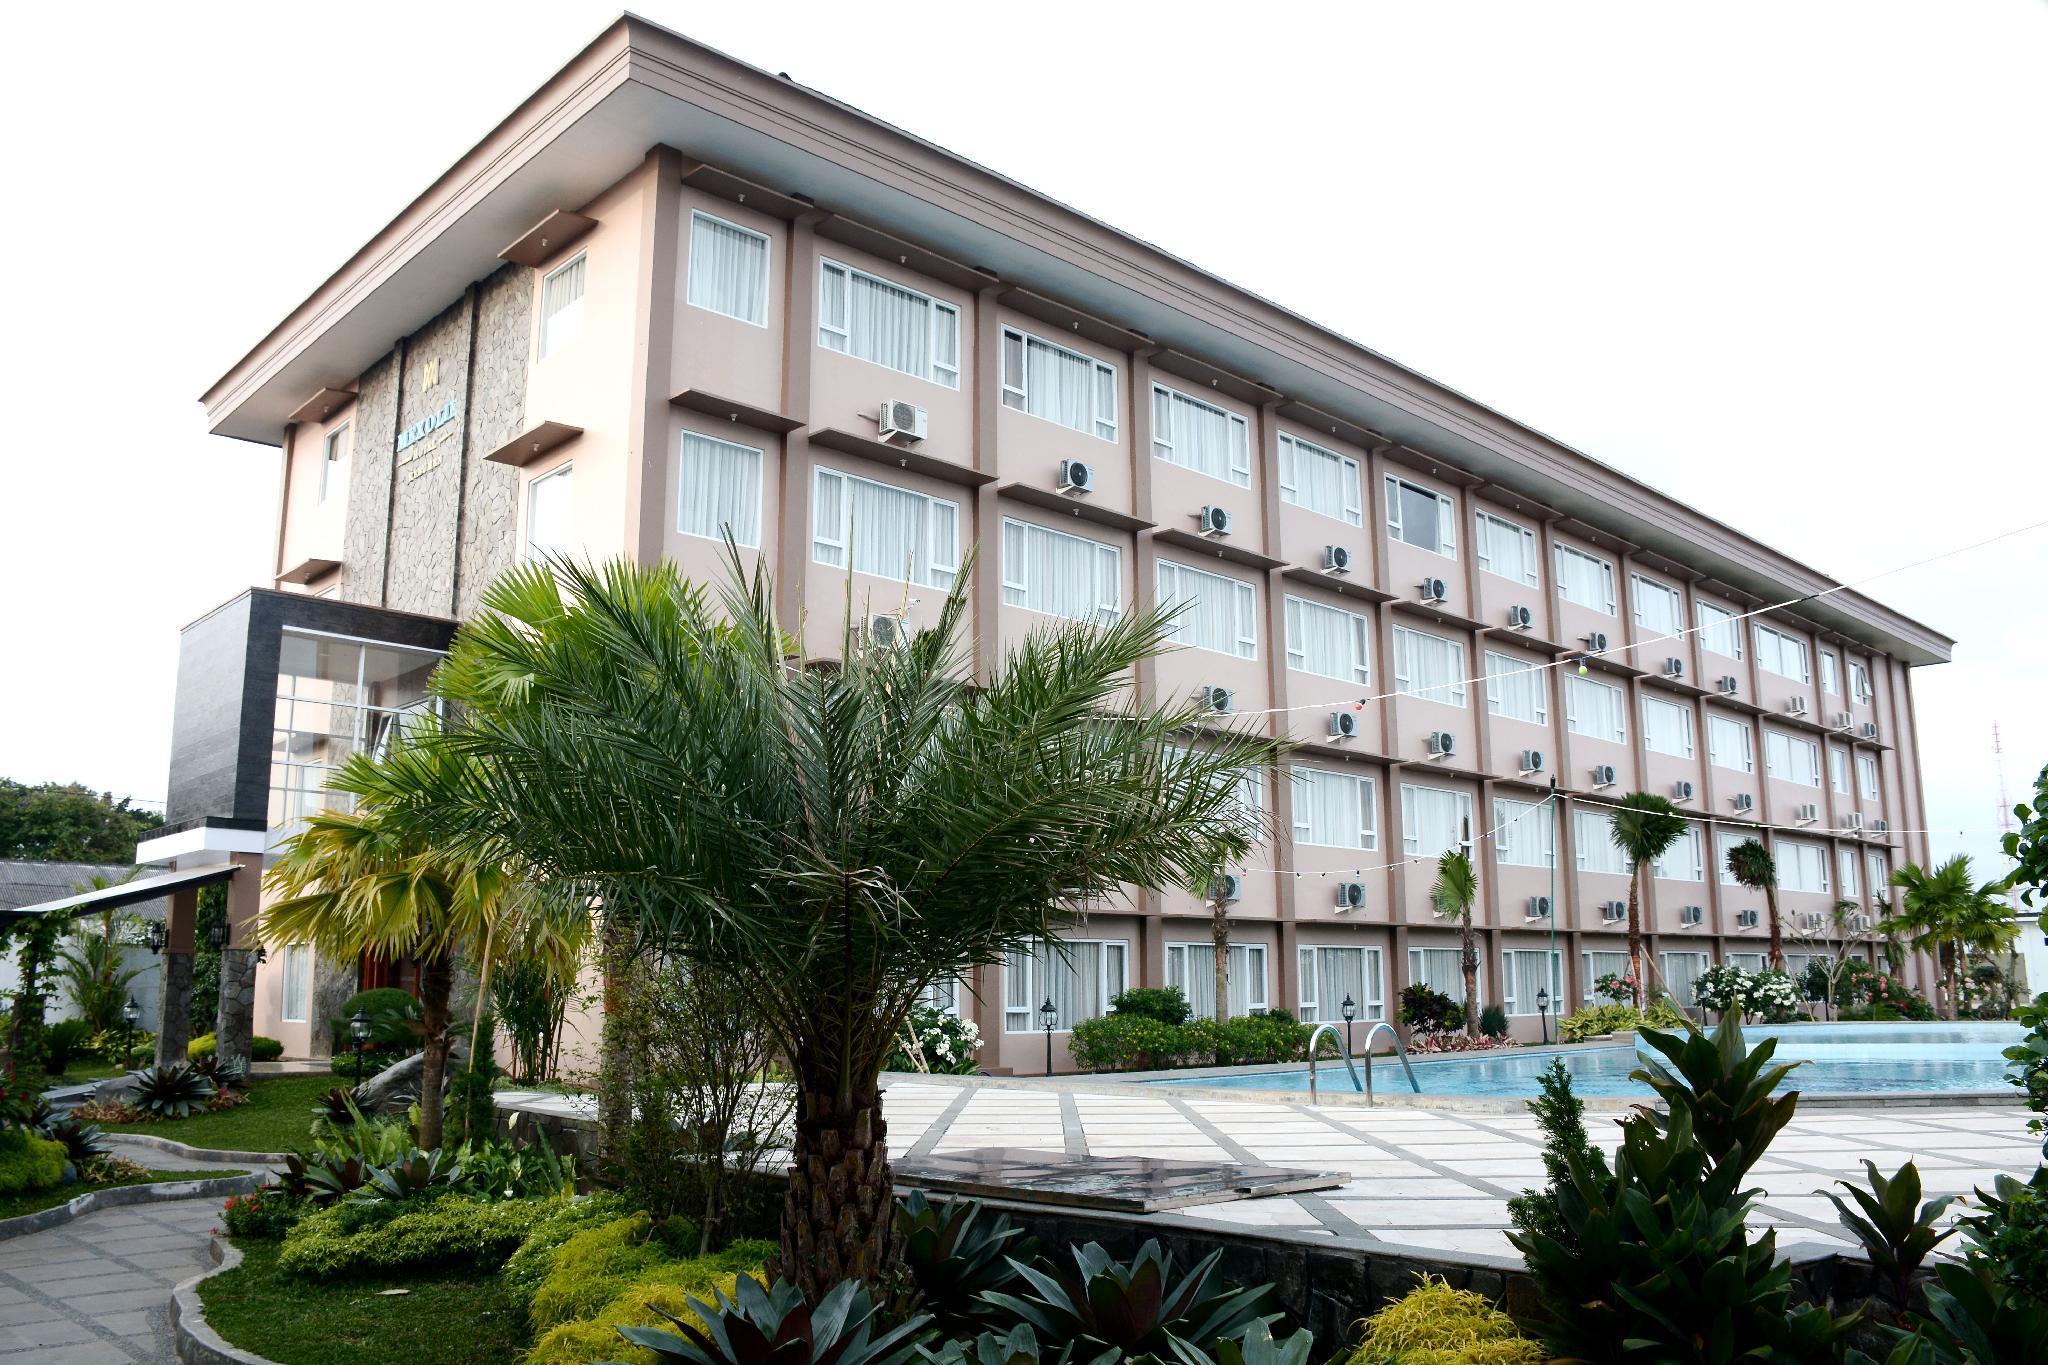 Mexolie Hotel Kebumen Booking Deals Photos Reviews